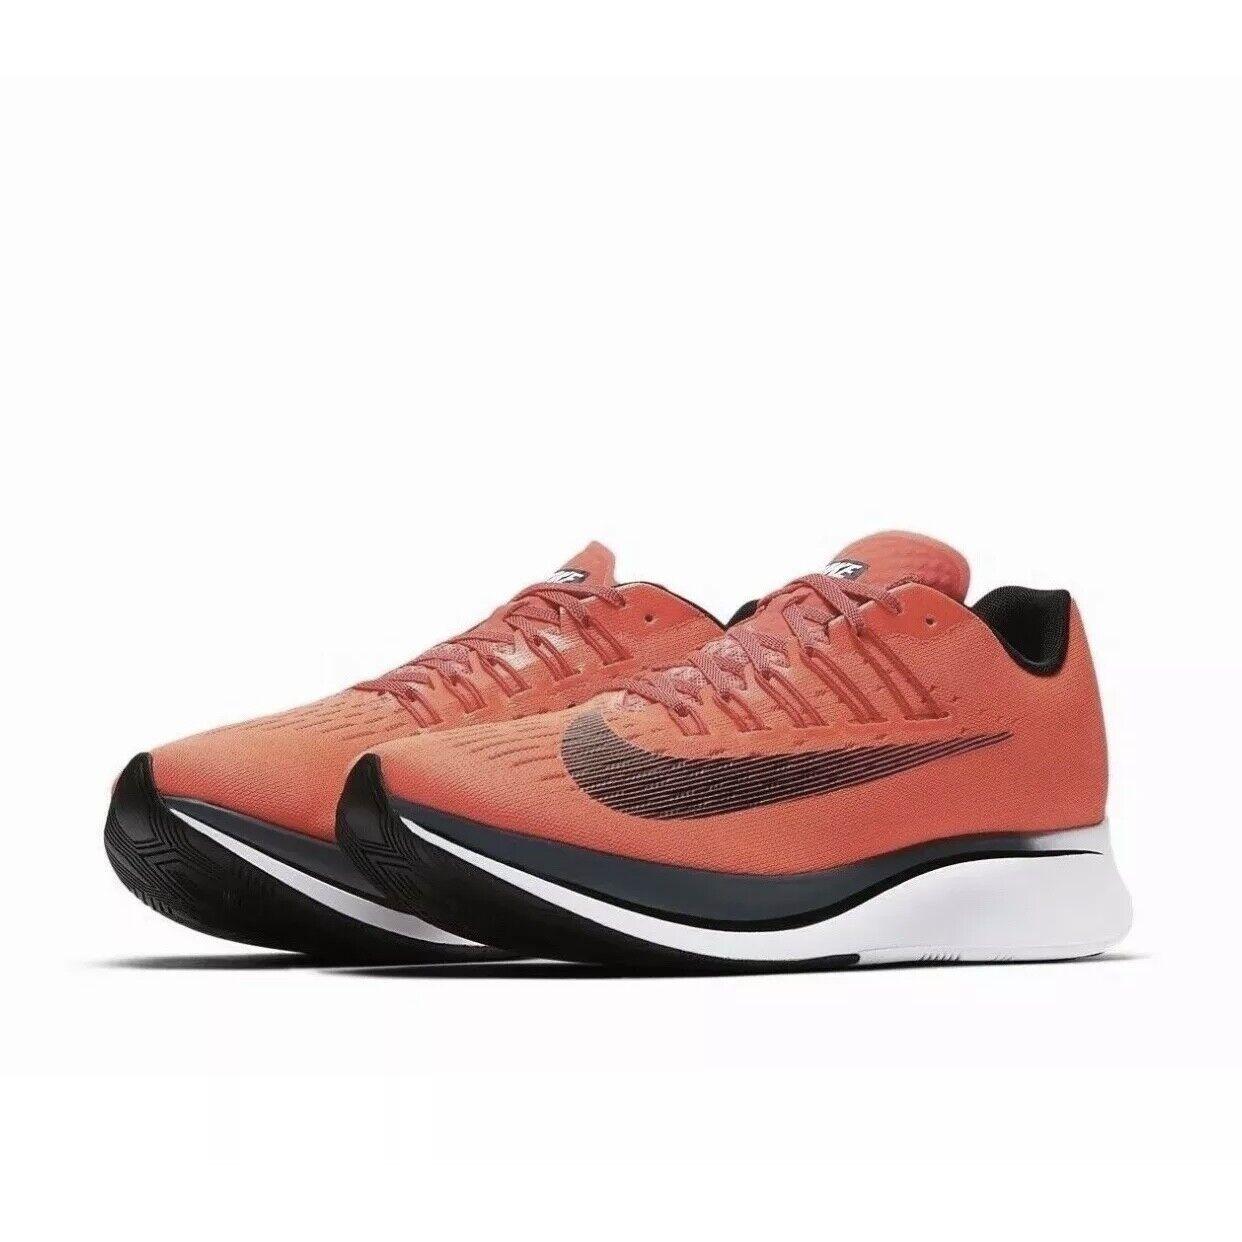 Nike Zoom Fly Men's Bright Crimson Black-blueee Fox shoes (880848 614) Sz 10